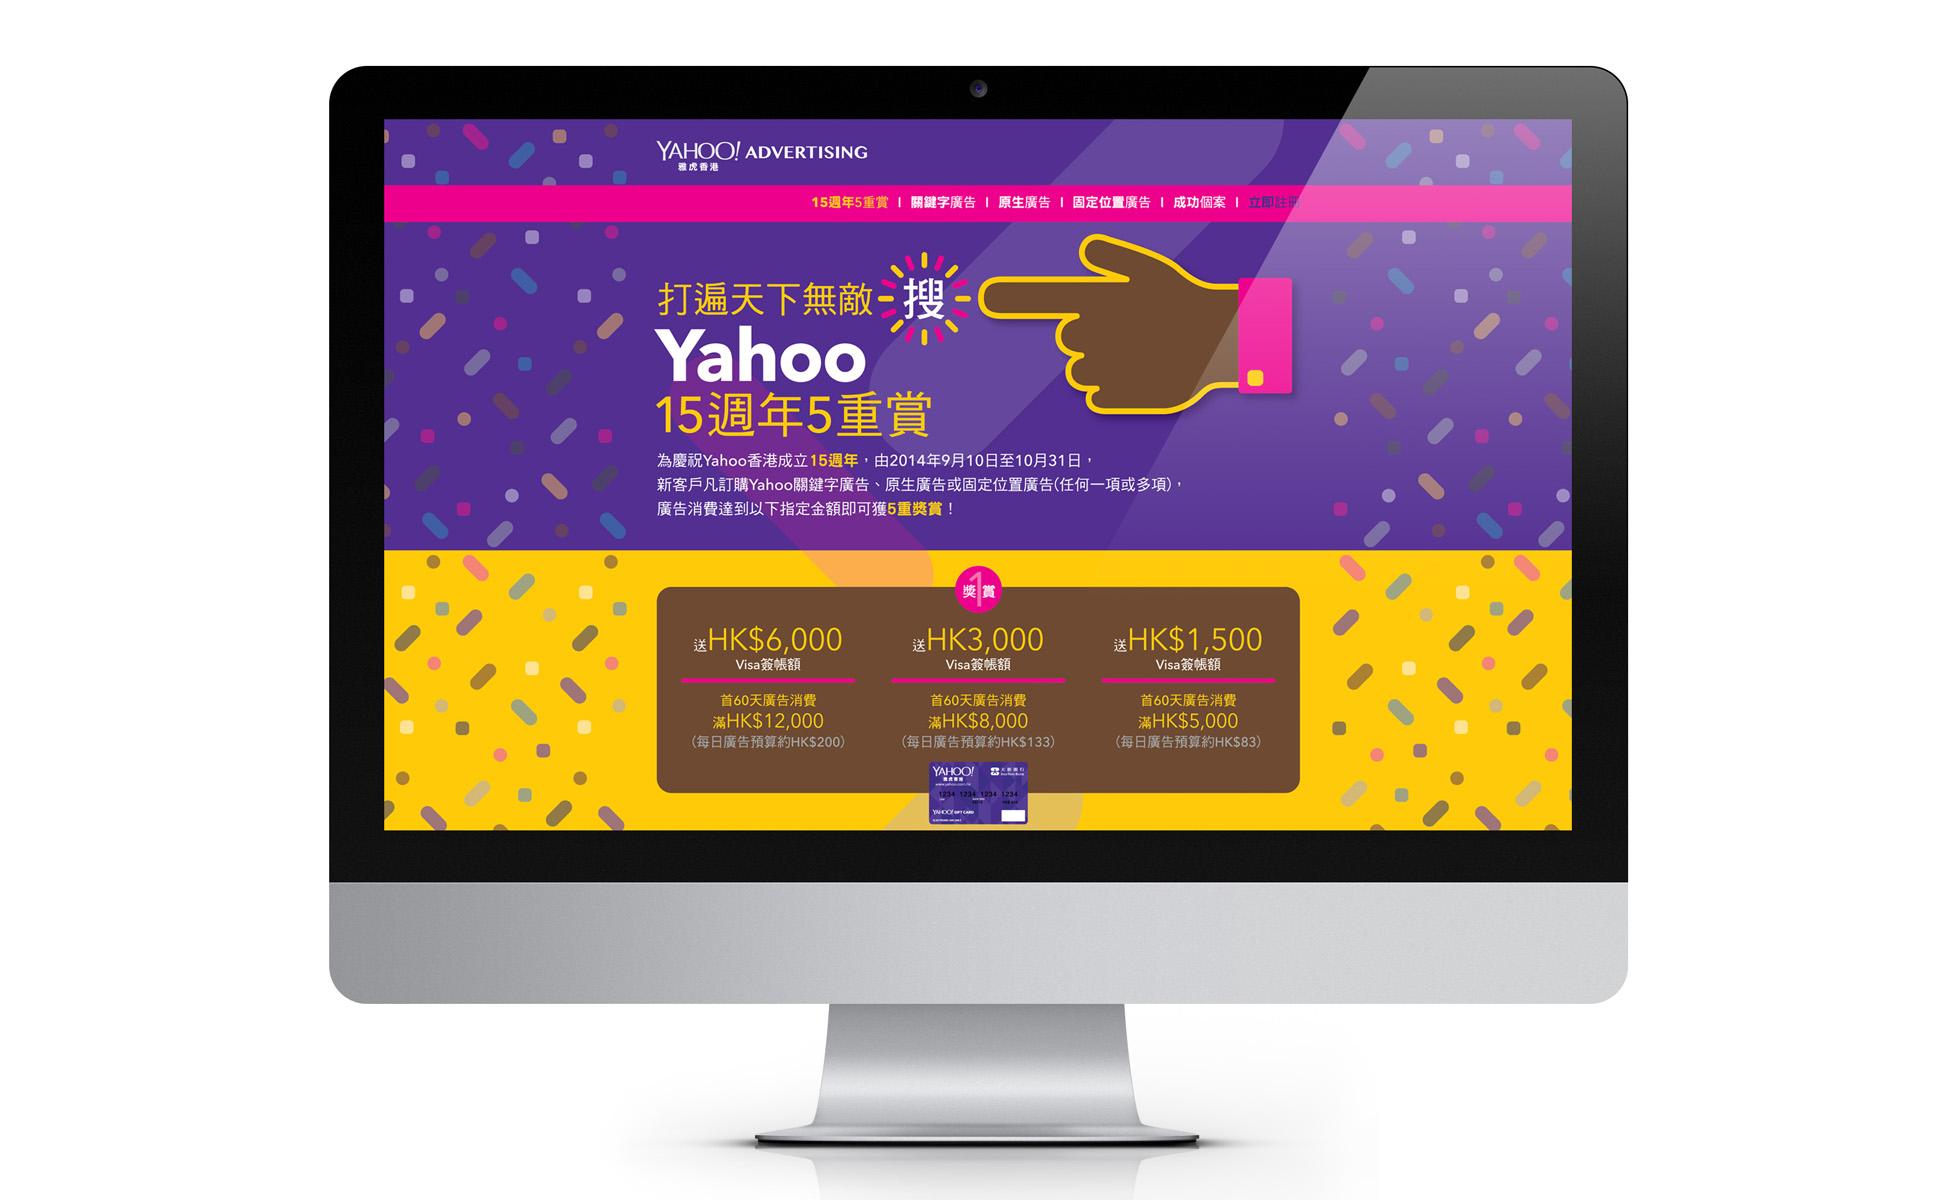 Yahoo_iMac-1.jpg